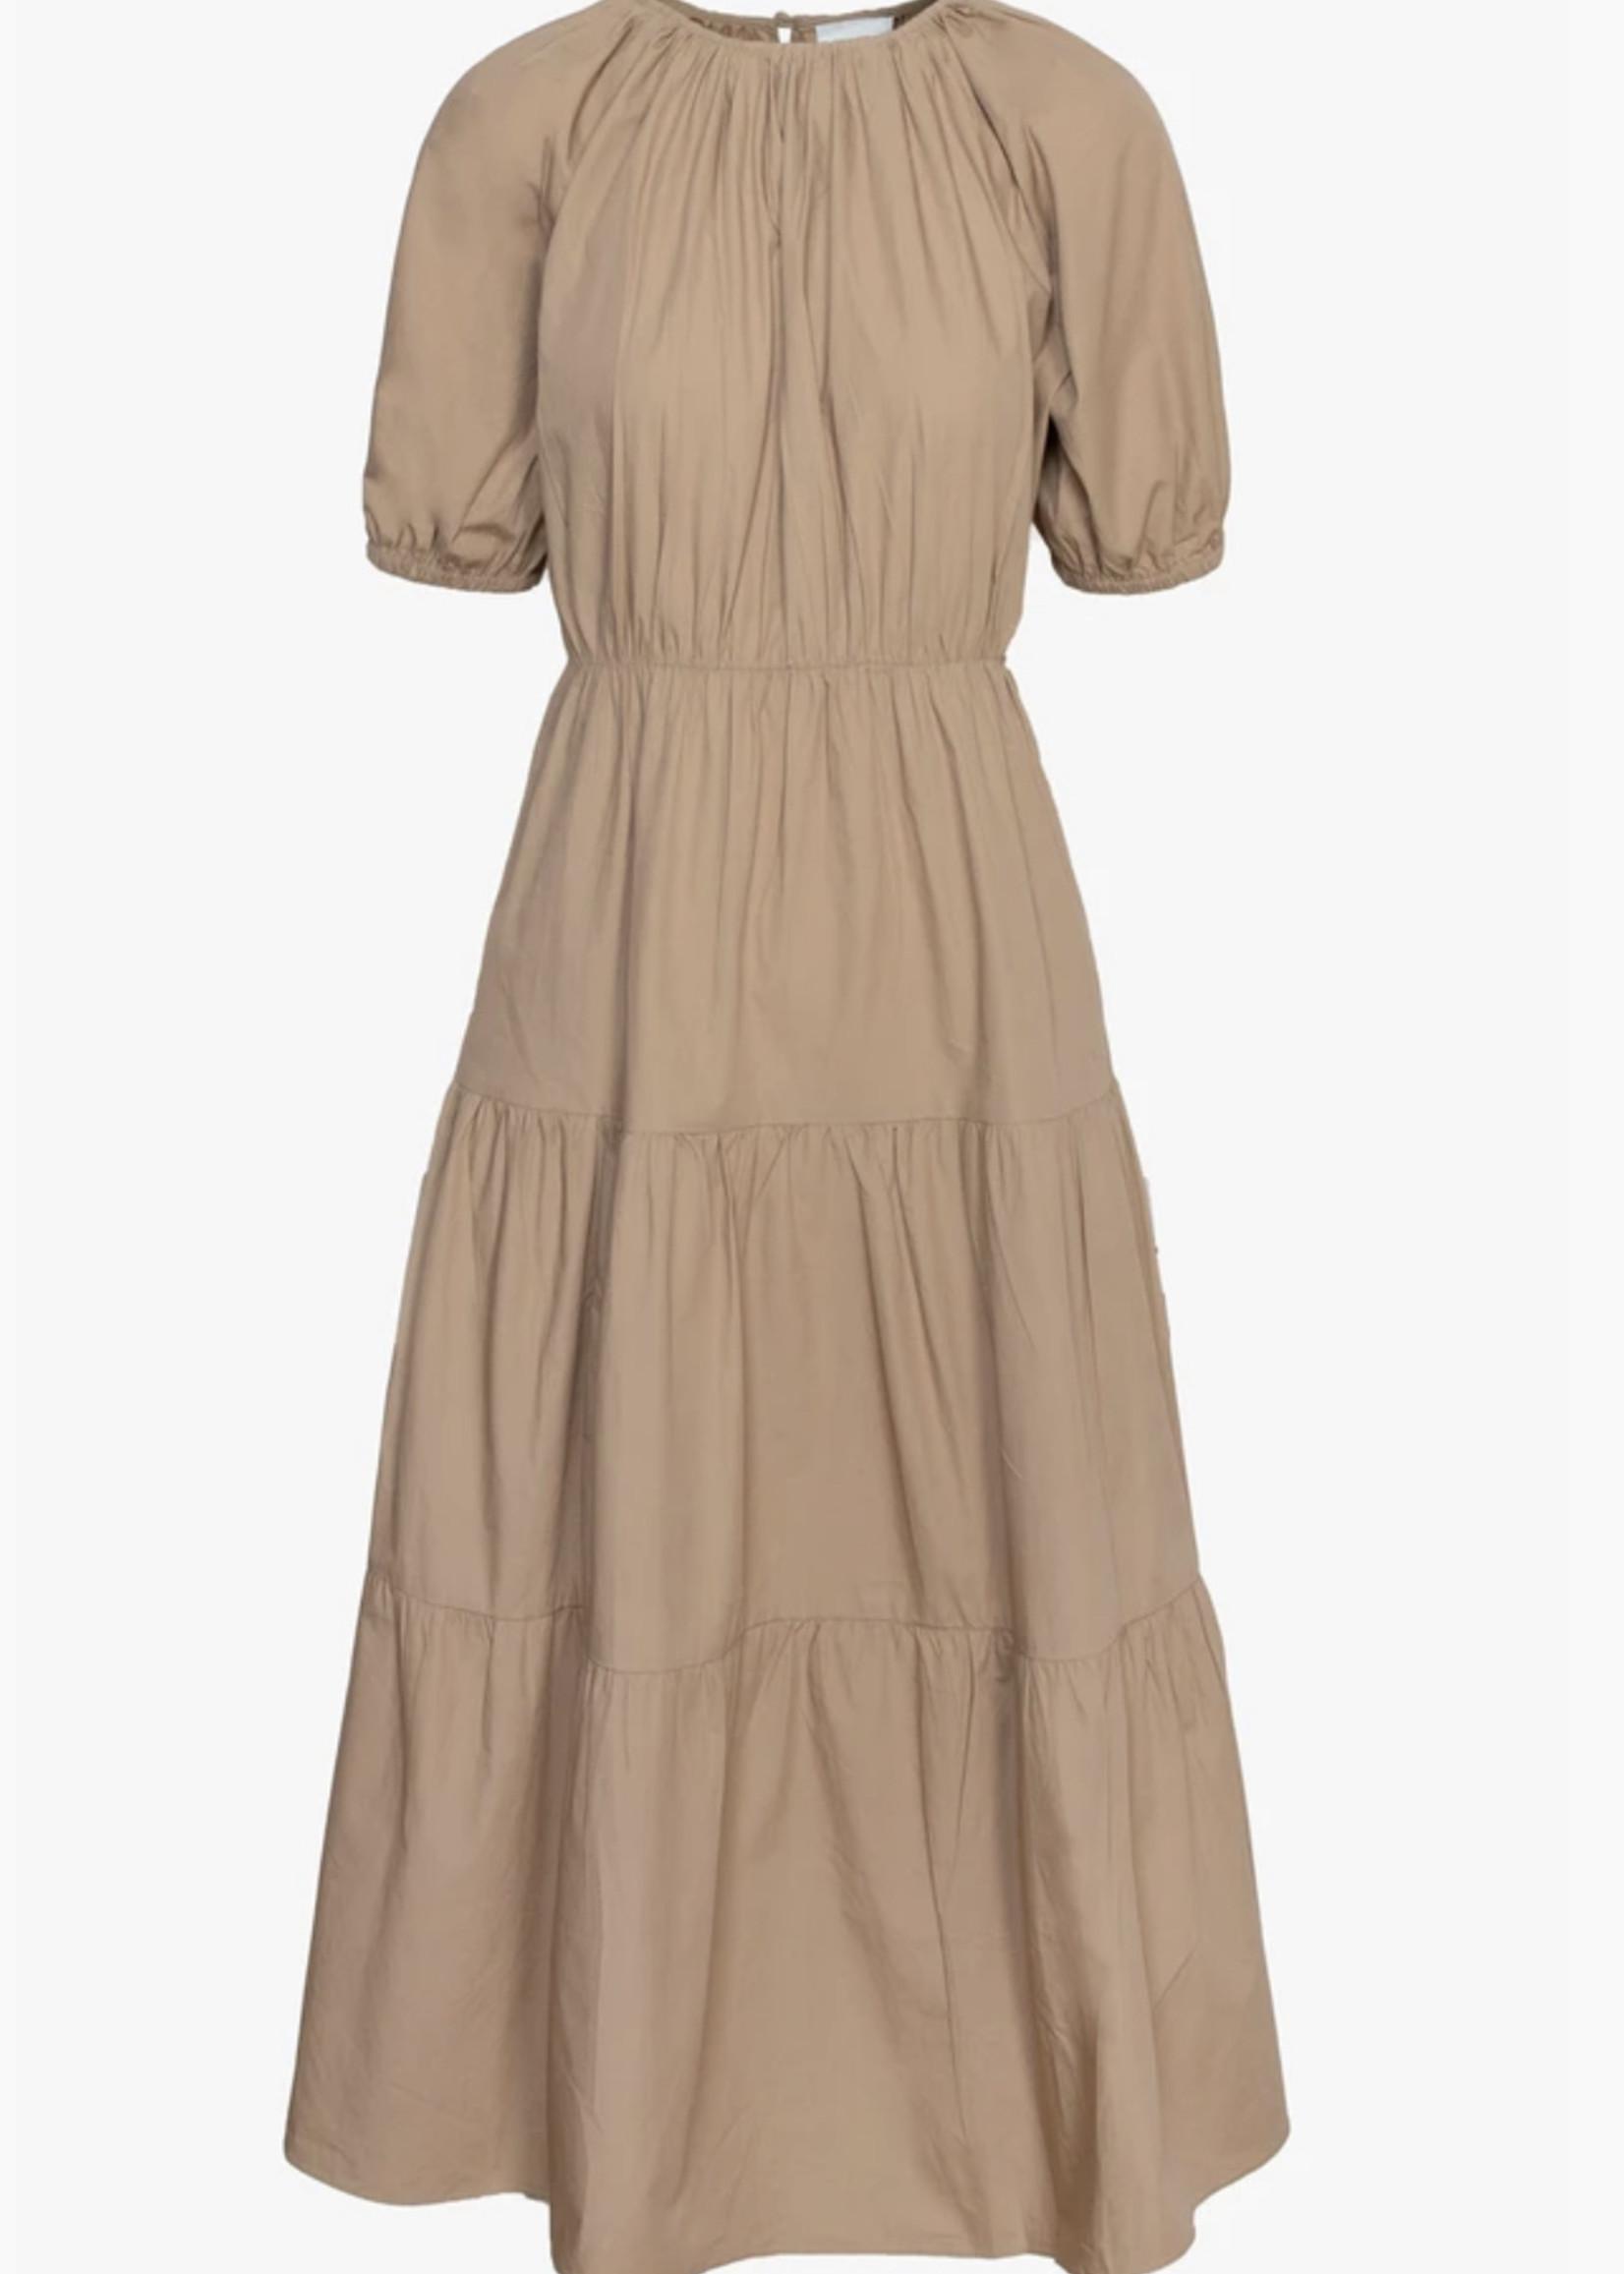 Elitaire Boutique Poplin Tiered Tan Midi Dress